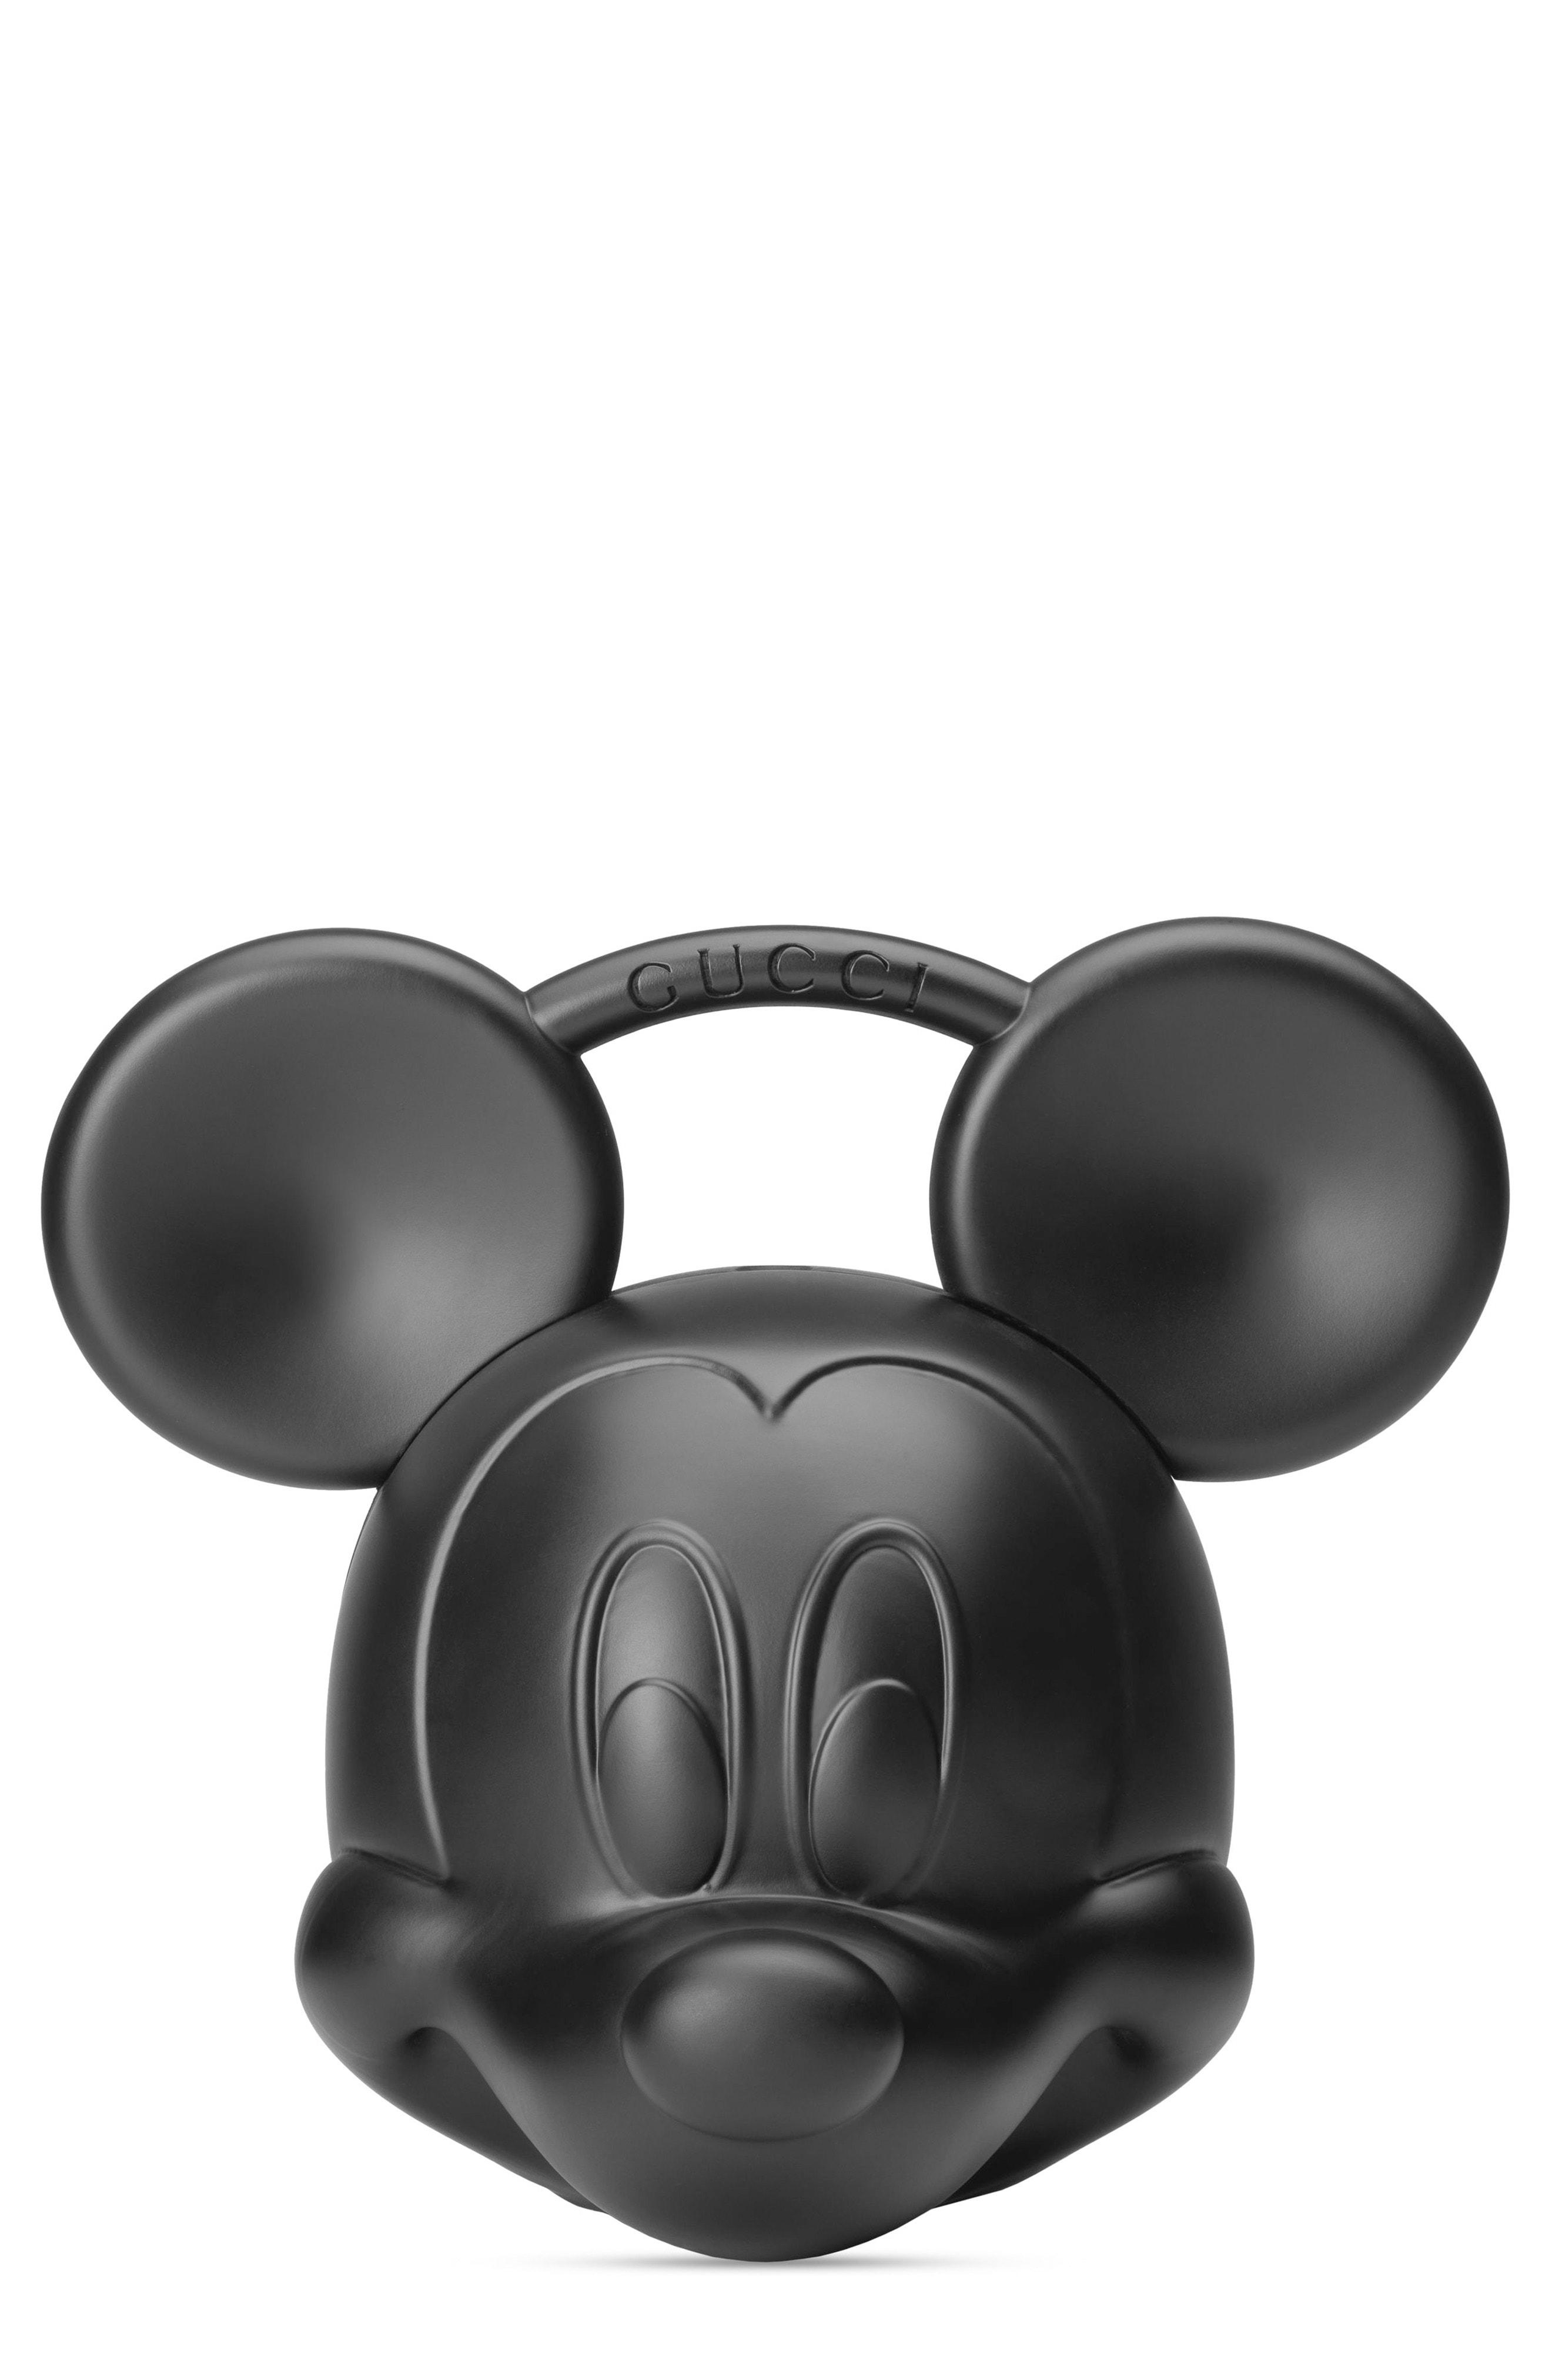 77d64439dc47 Gucci X Disney Mickey Mouse Top Handle Bag - Black | ModeSens